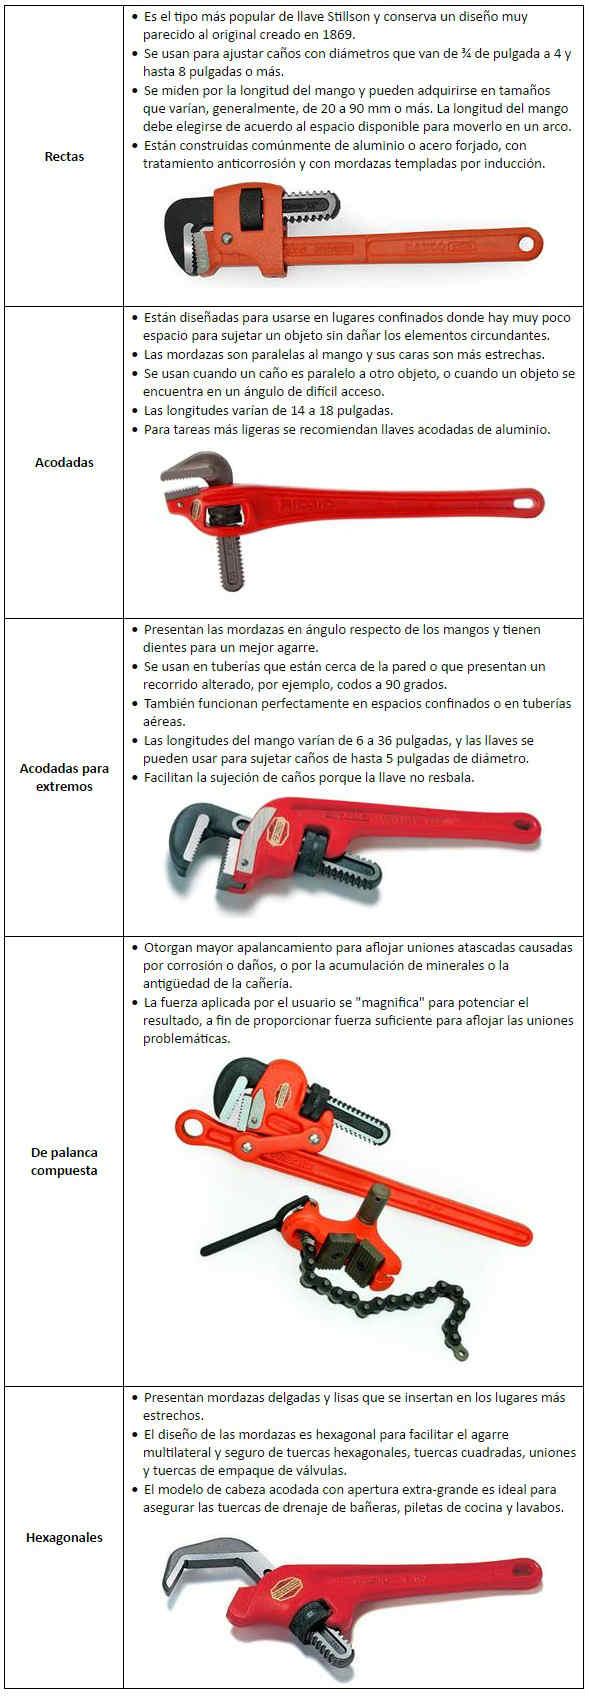 Tipos de llaves Stillson